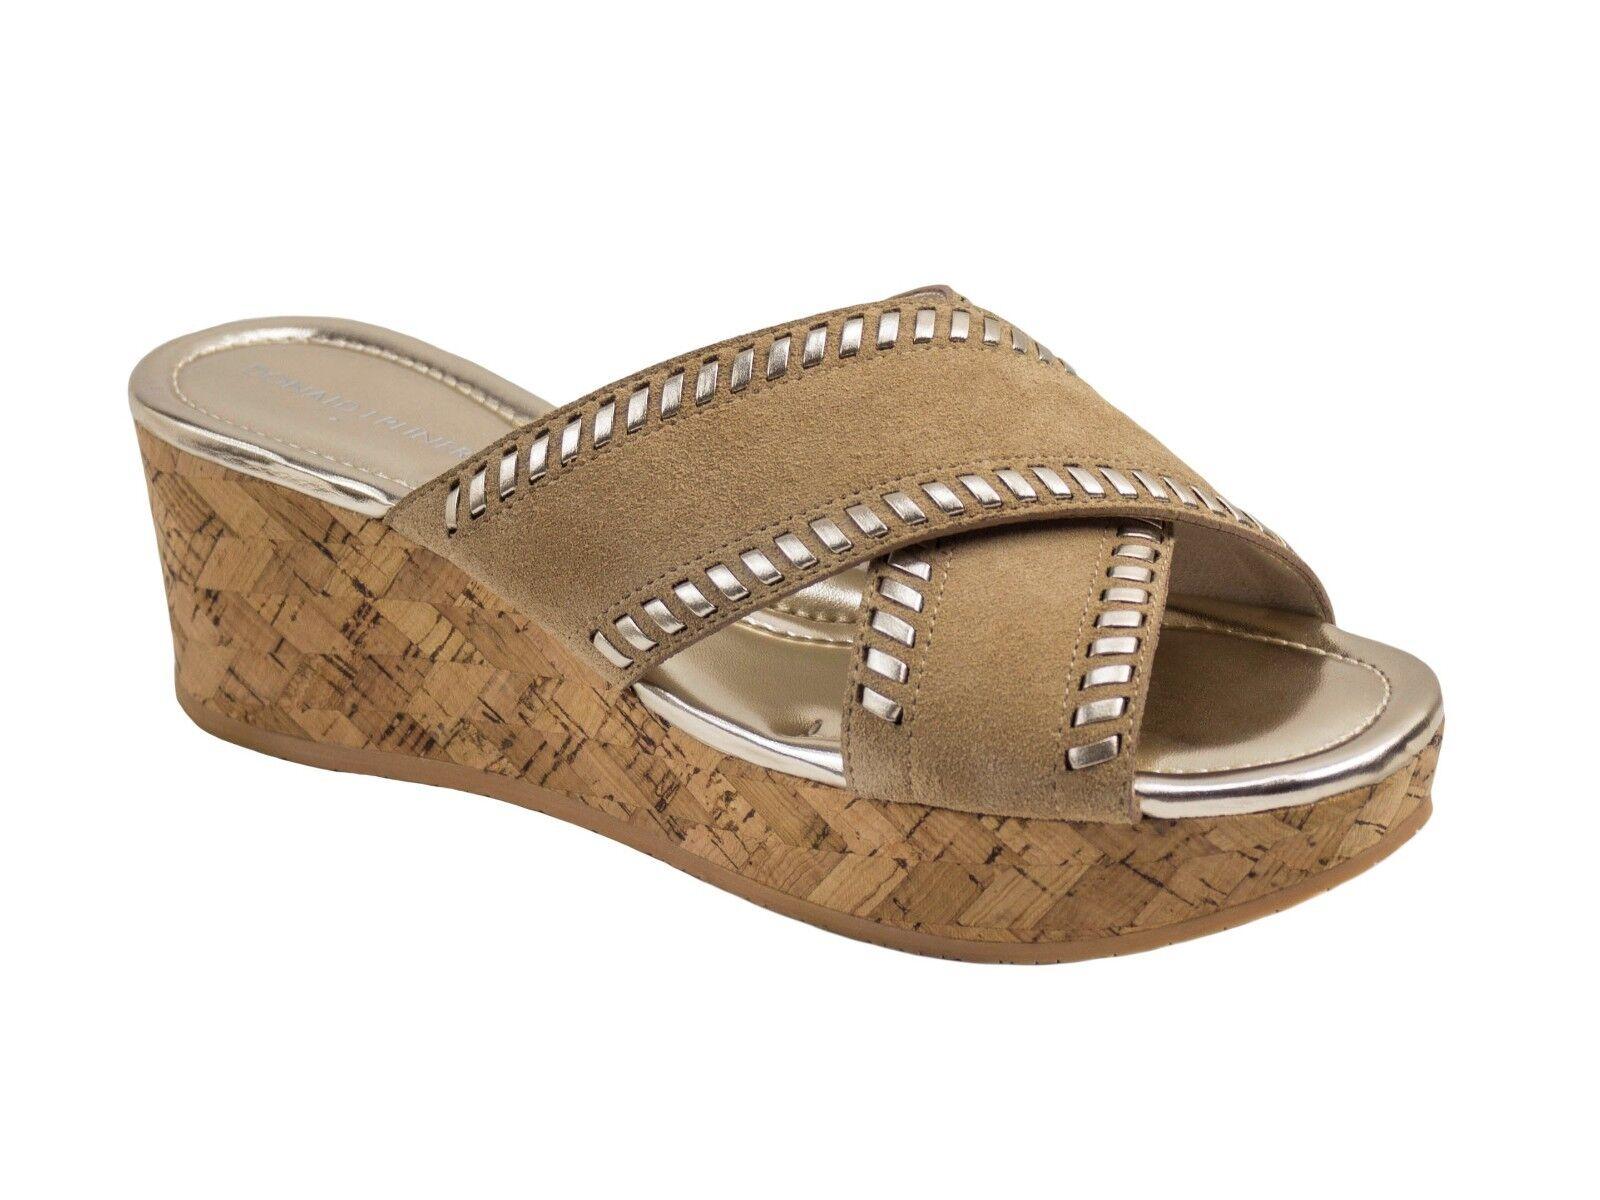 Donald J Pliner Savee Beige Whipstitch Cork Wedge Slide Sandal Sandal Sandal Sz 9 NEW  188 ac9ccc